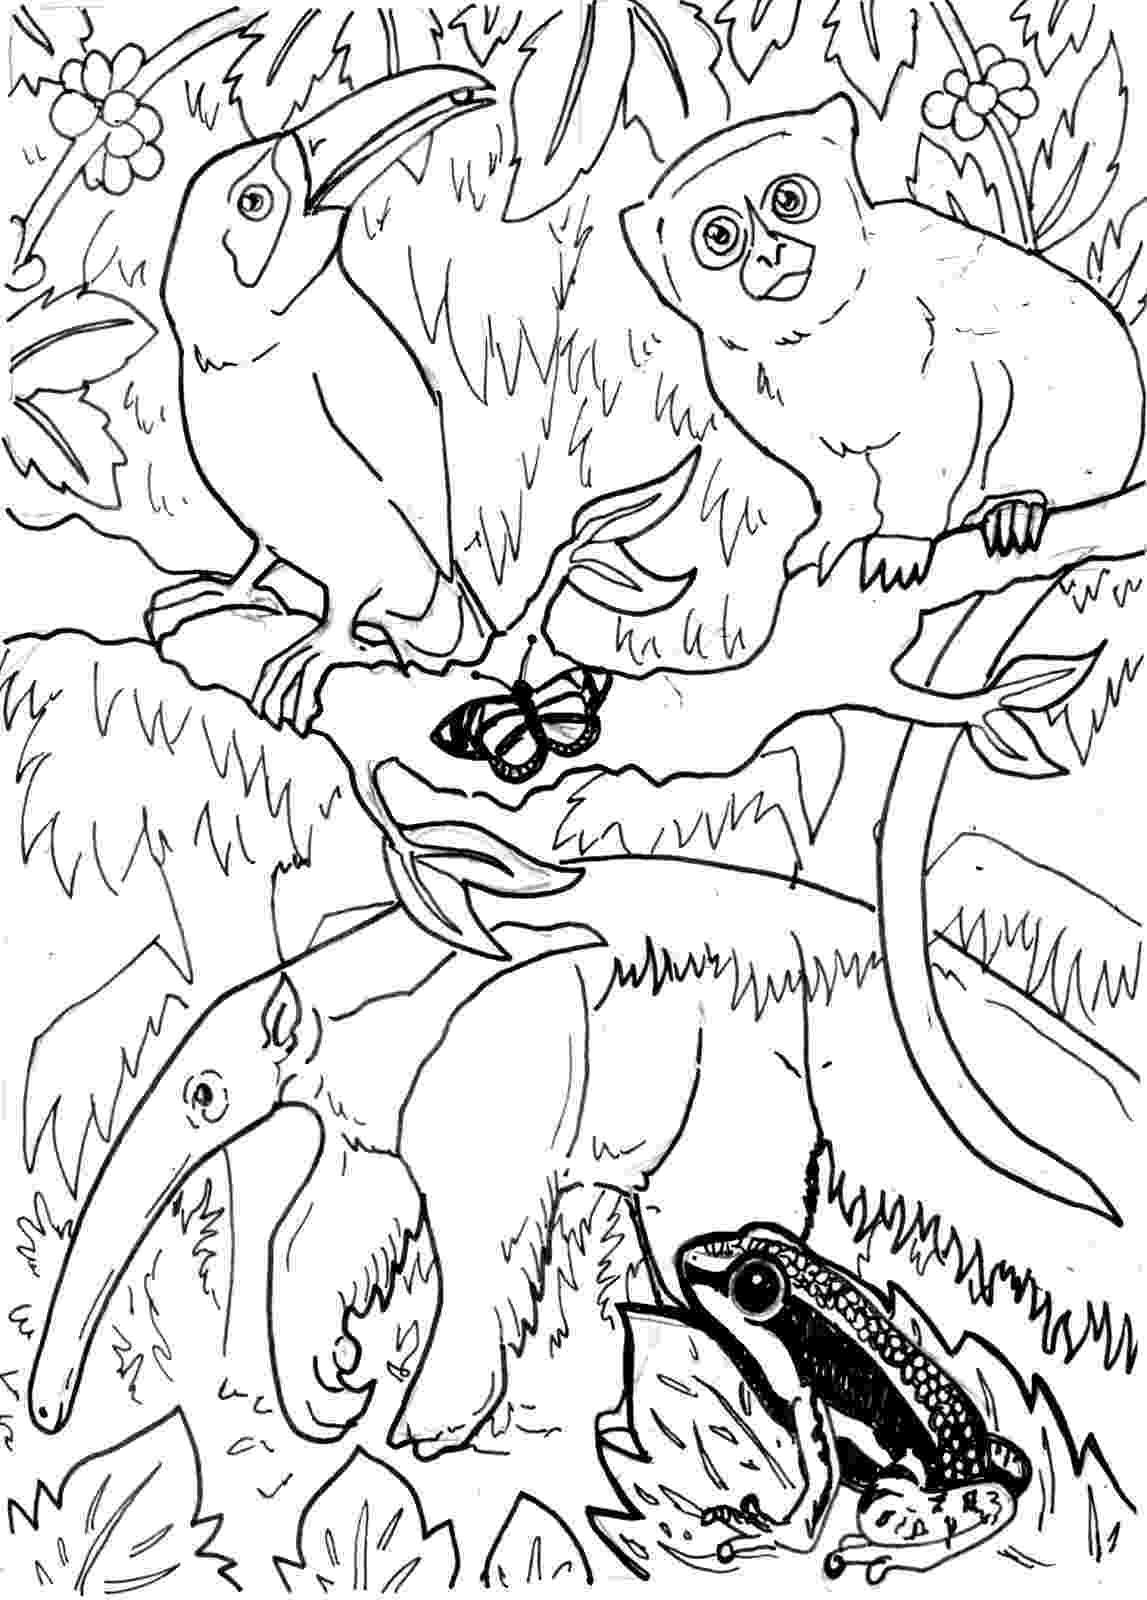 rainforest animals to color rainforest animal coloring pages getcoloringpagescom color rainforest animals to